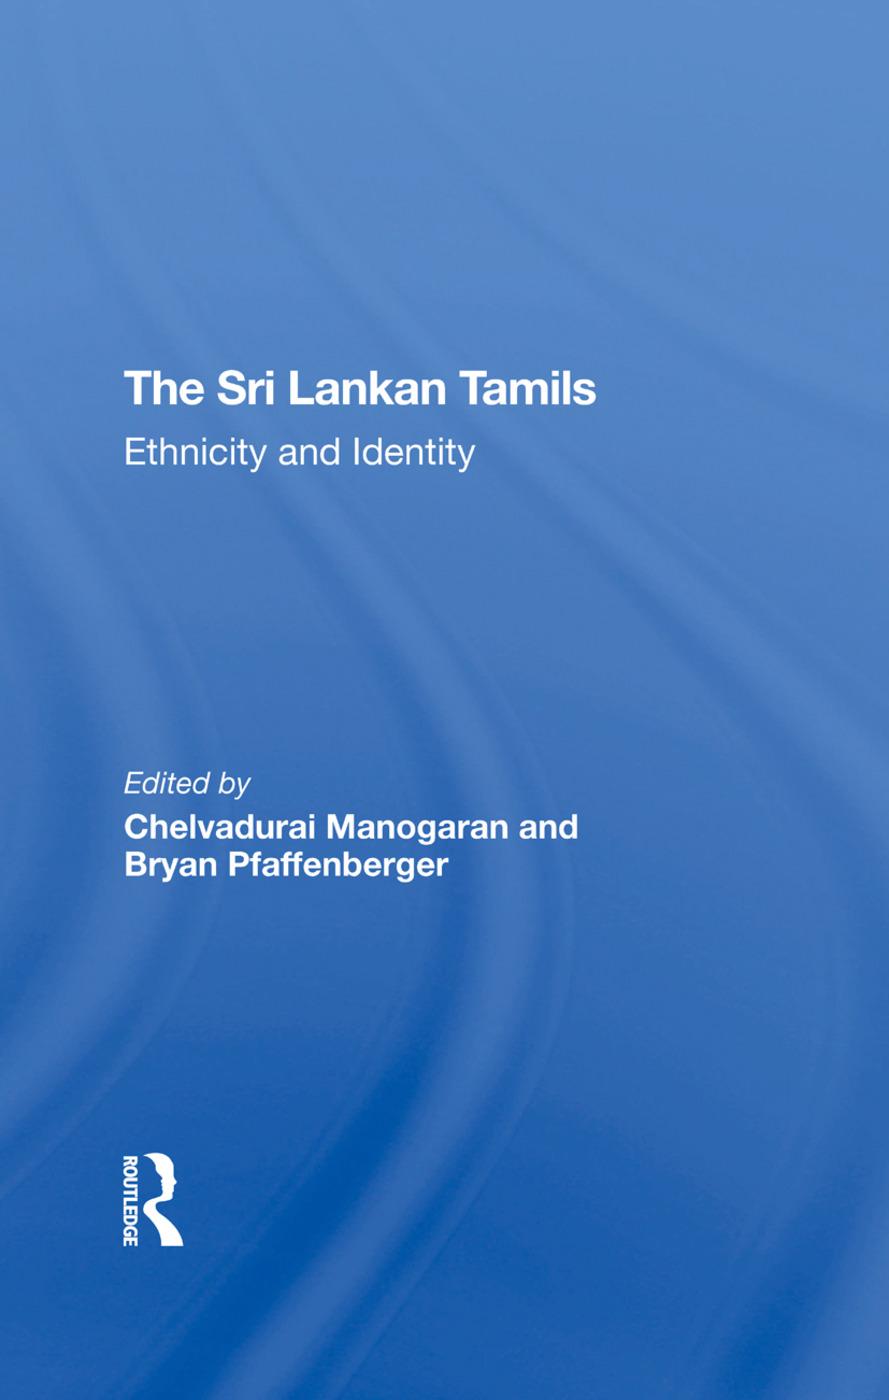 Introduction: The Sri Lankan Tamils